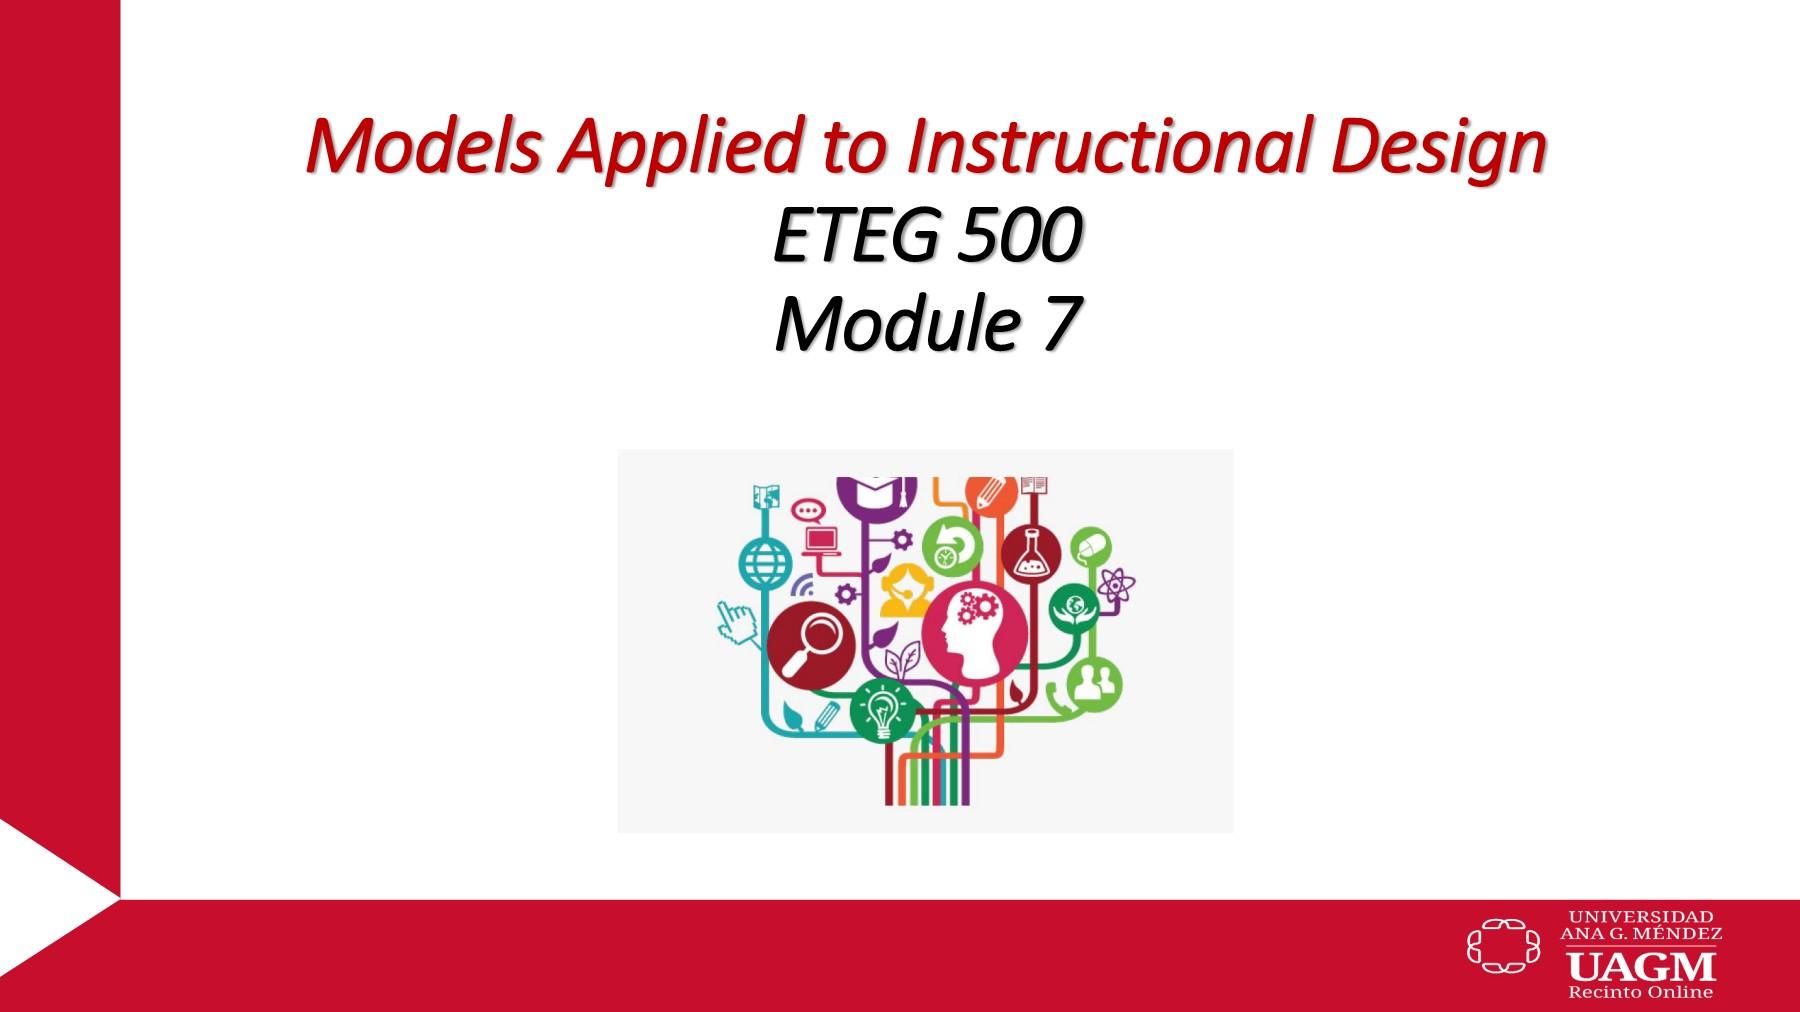 English Modulo 7 Eteg 500 Innovative Tools For The Development Of Instructional Design Recinto Online Flip Pdf Pubhtml5